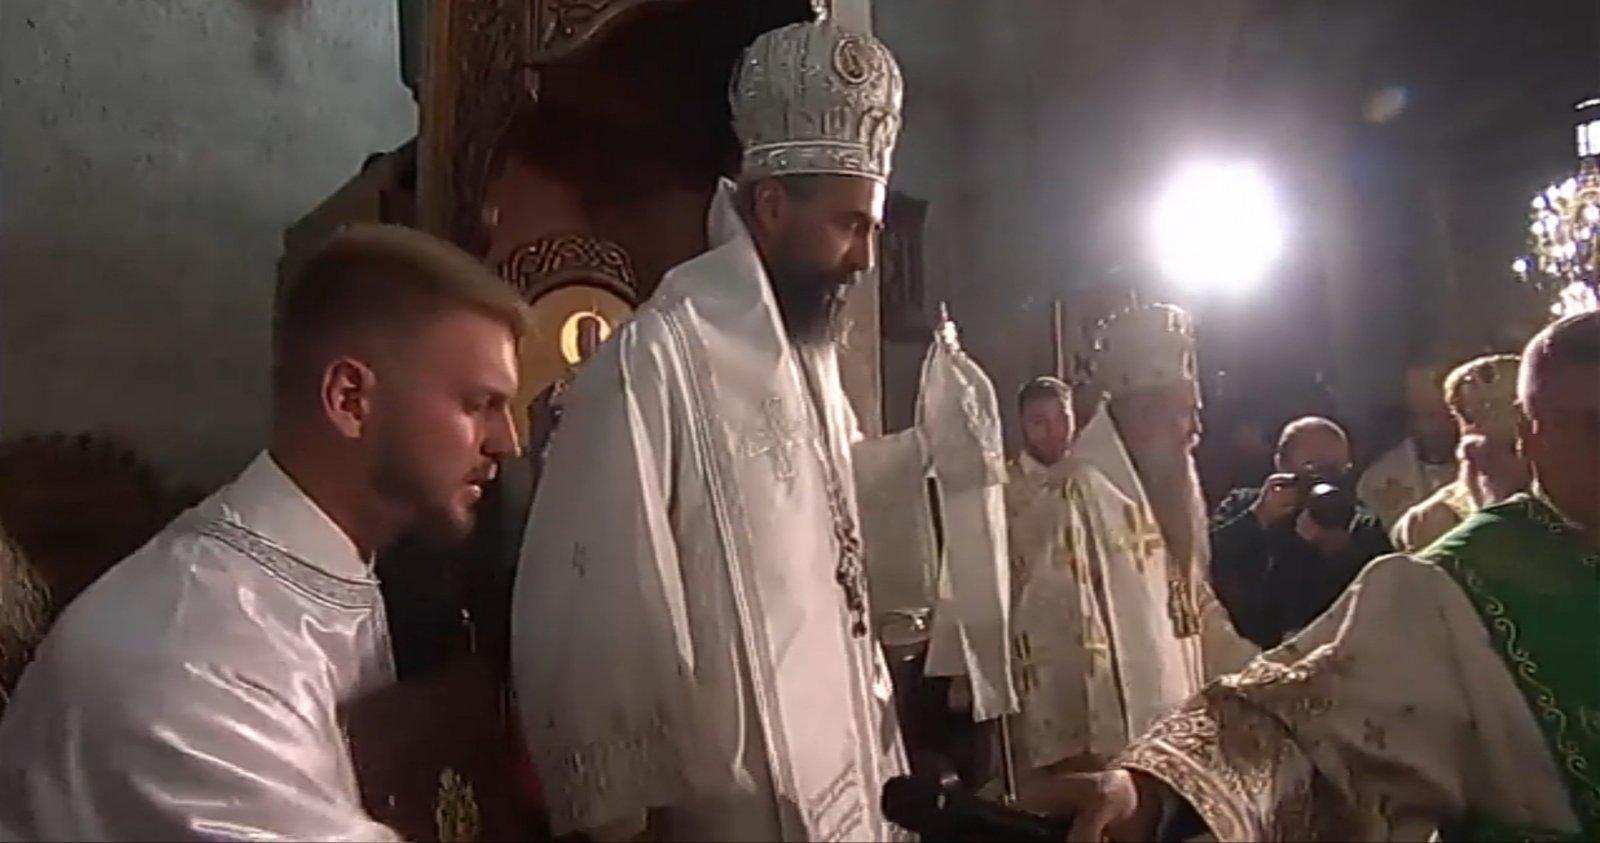 Ustoličen Metodije uz prenos na Parlamentarnom kanalu TVCG